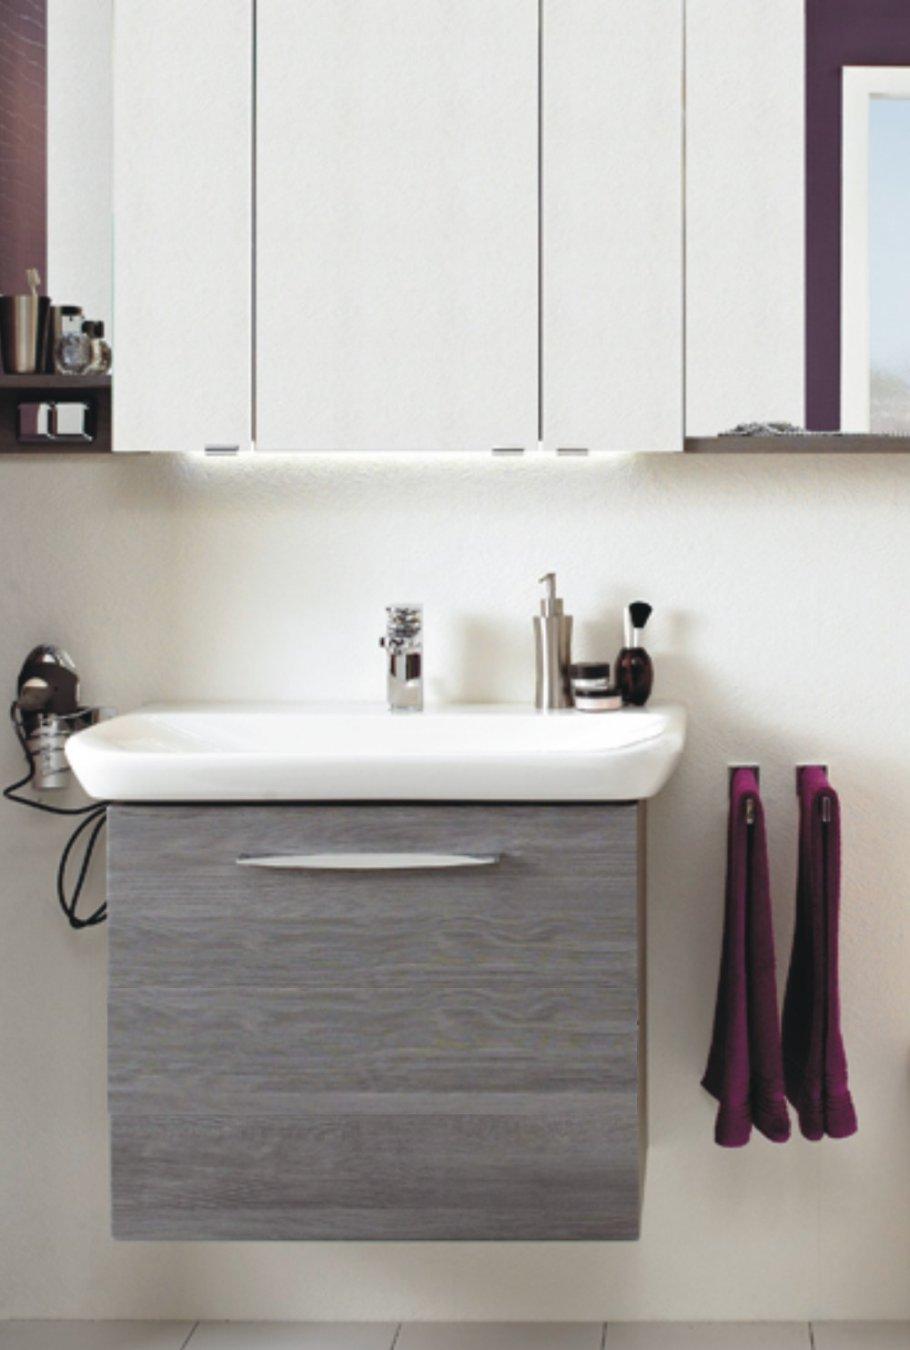 pelipal pcon keramag myday 80 cm badm bel arcom center. Black Bedroom Furniture Sets. Home Design Ideas